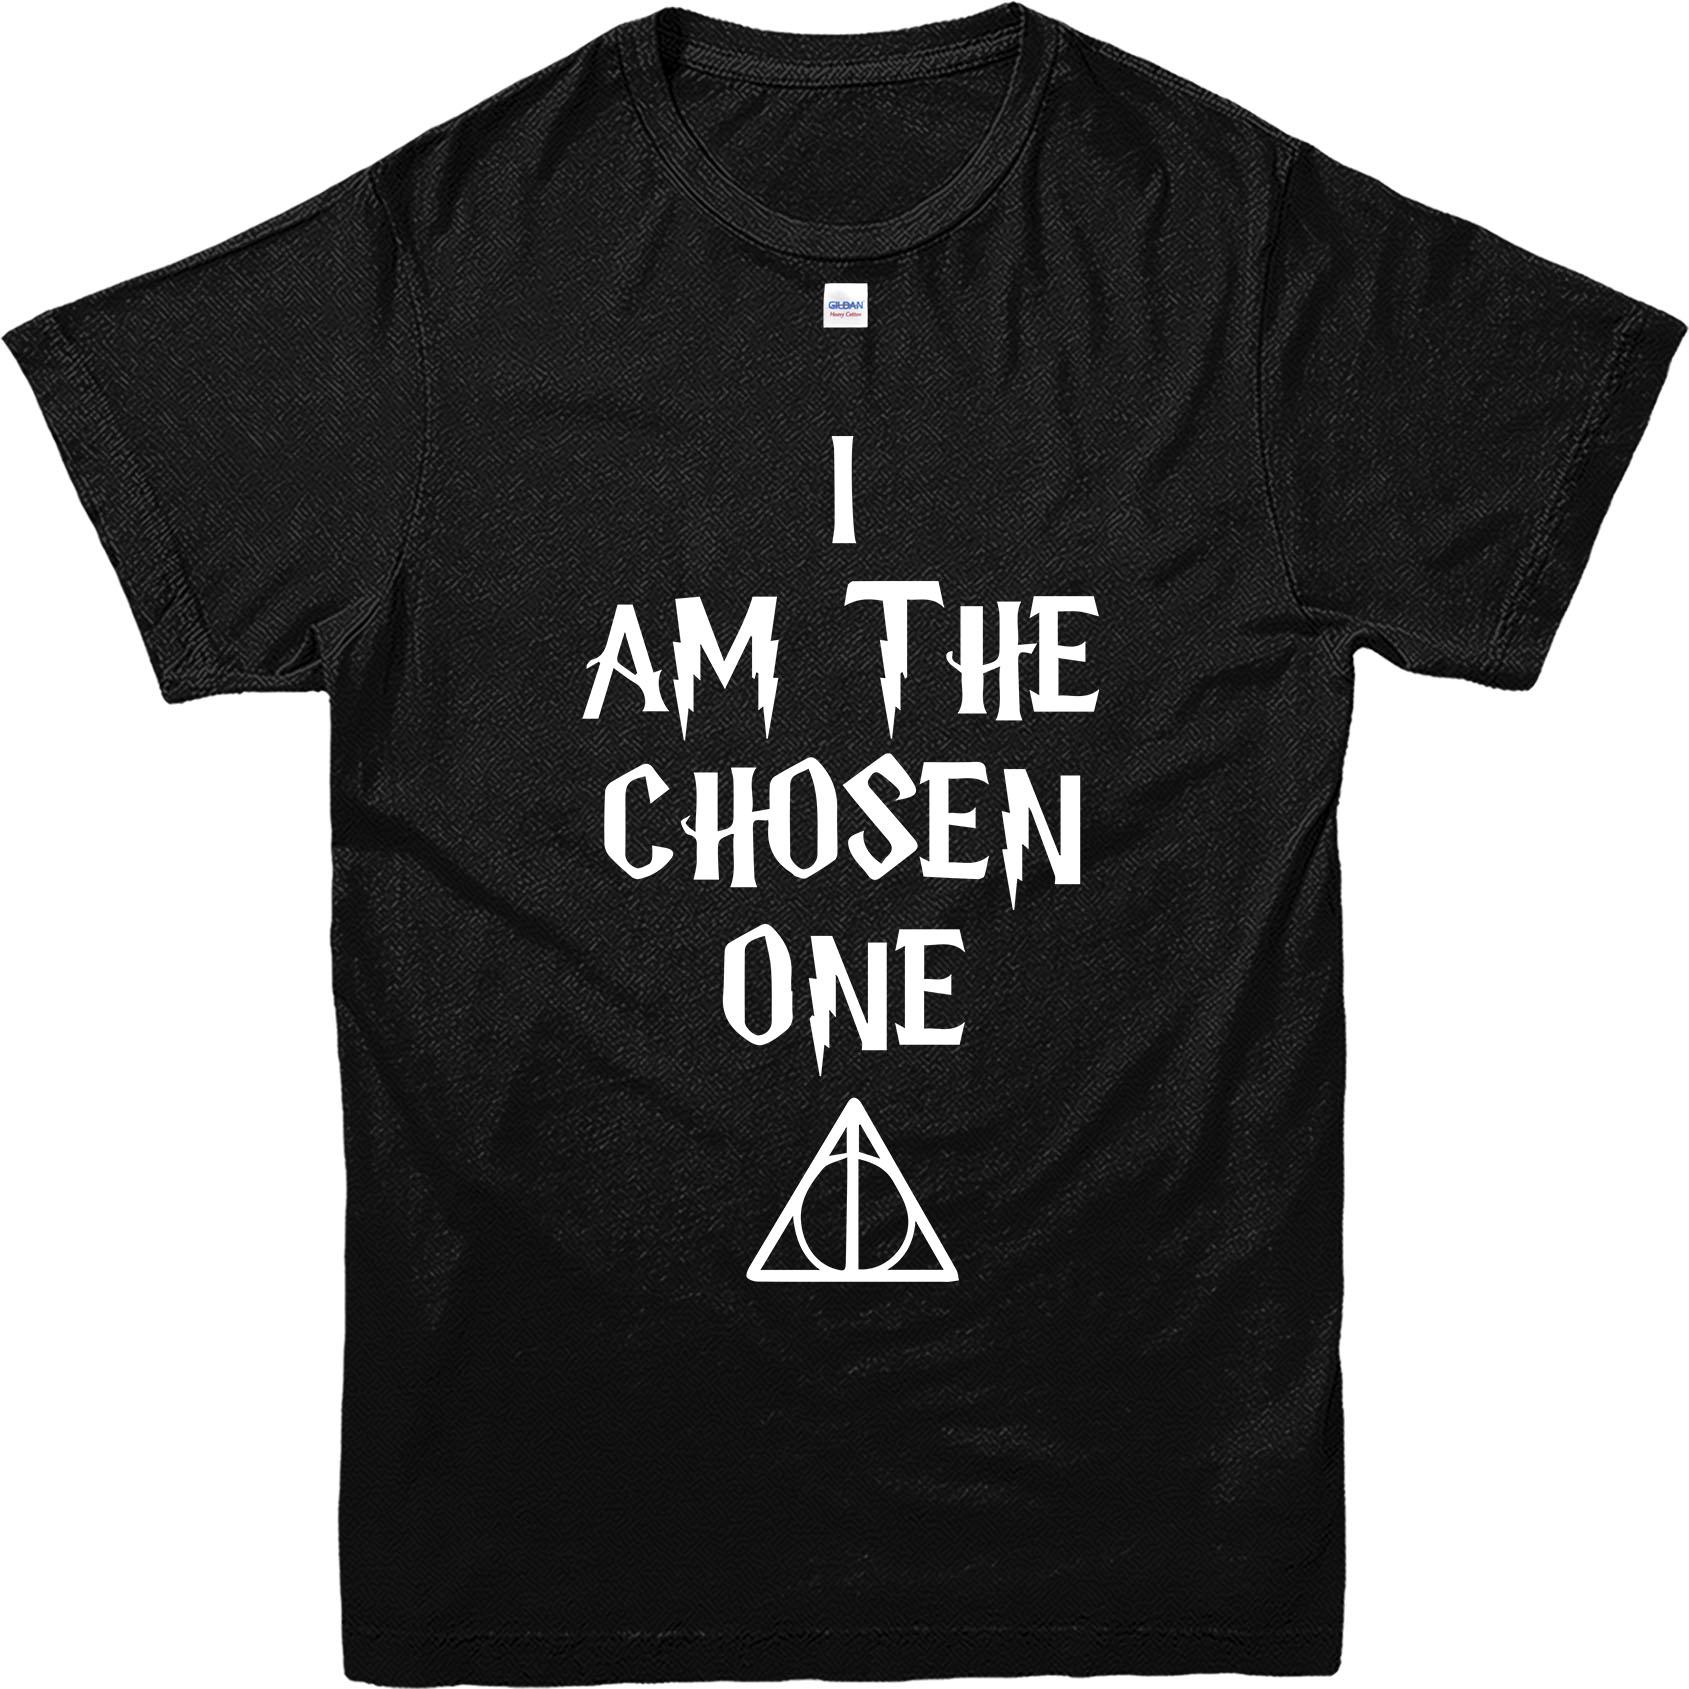 Harry potter t shirt i am the chosen one t shirt for One t shirt design